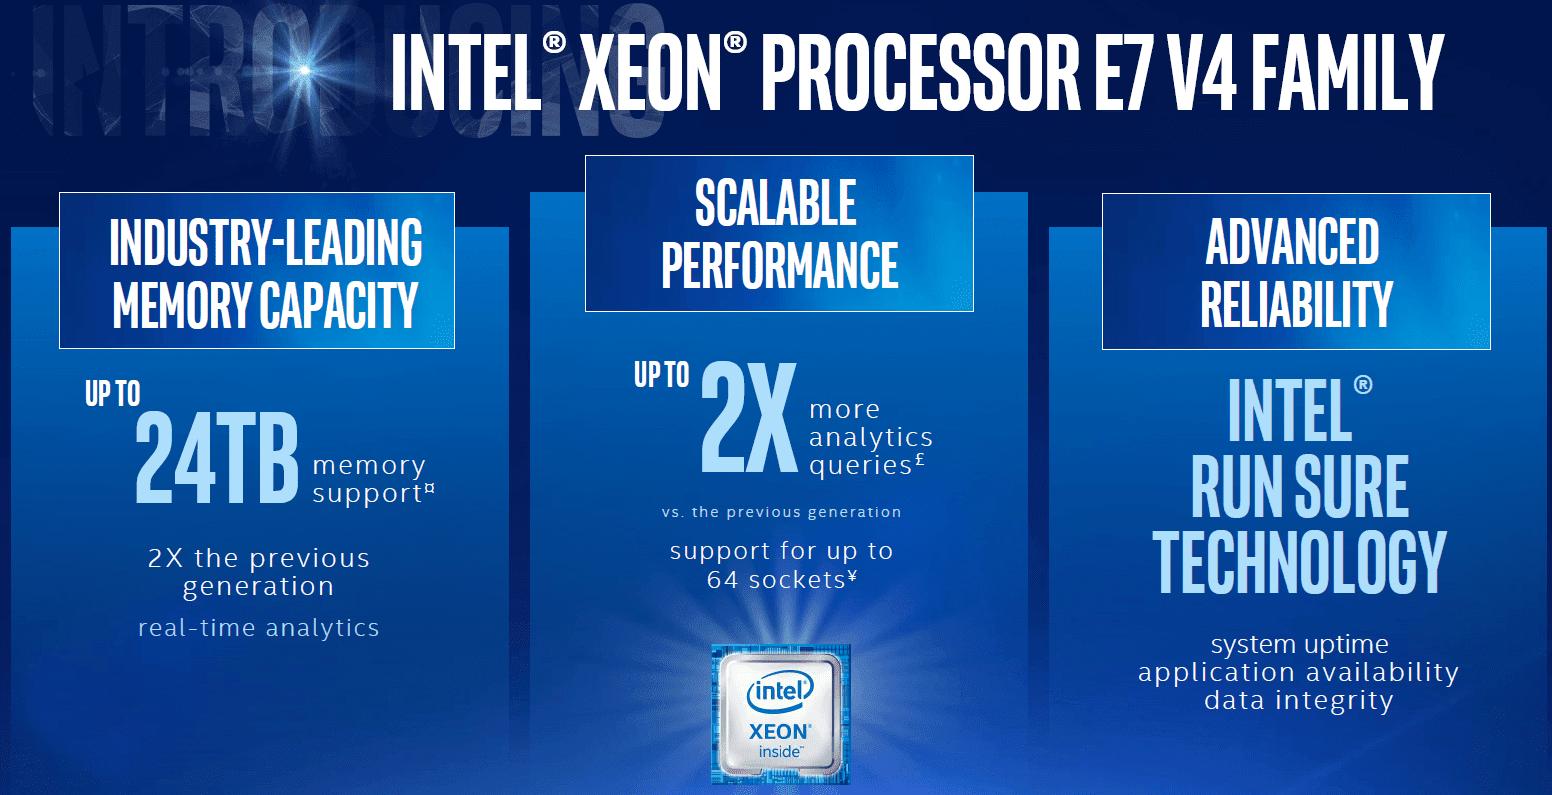 Titan X650 - Quad CPUs Intel Xeon E7-4800 / E7-8800 V4 Series HPC Super  Workstation up to 96 cores